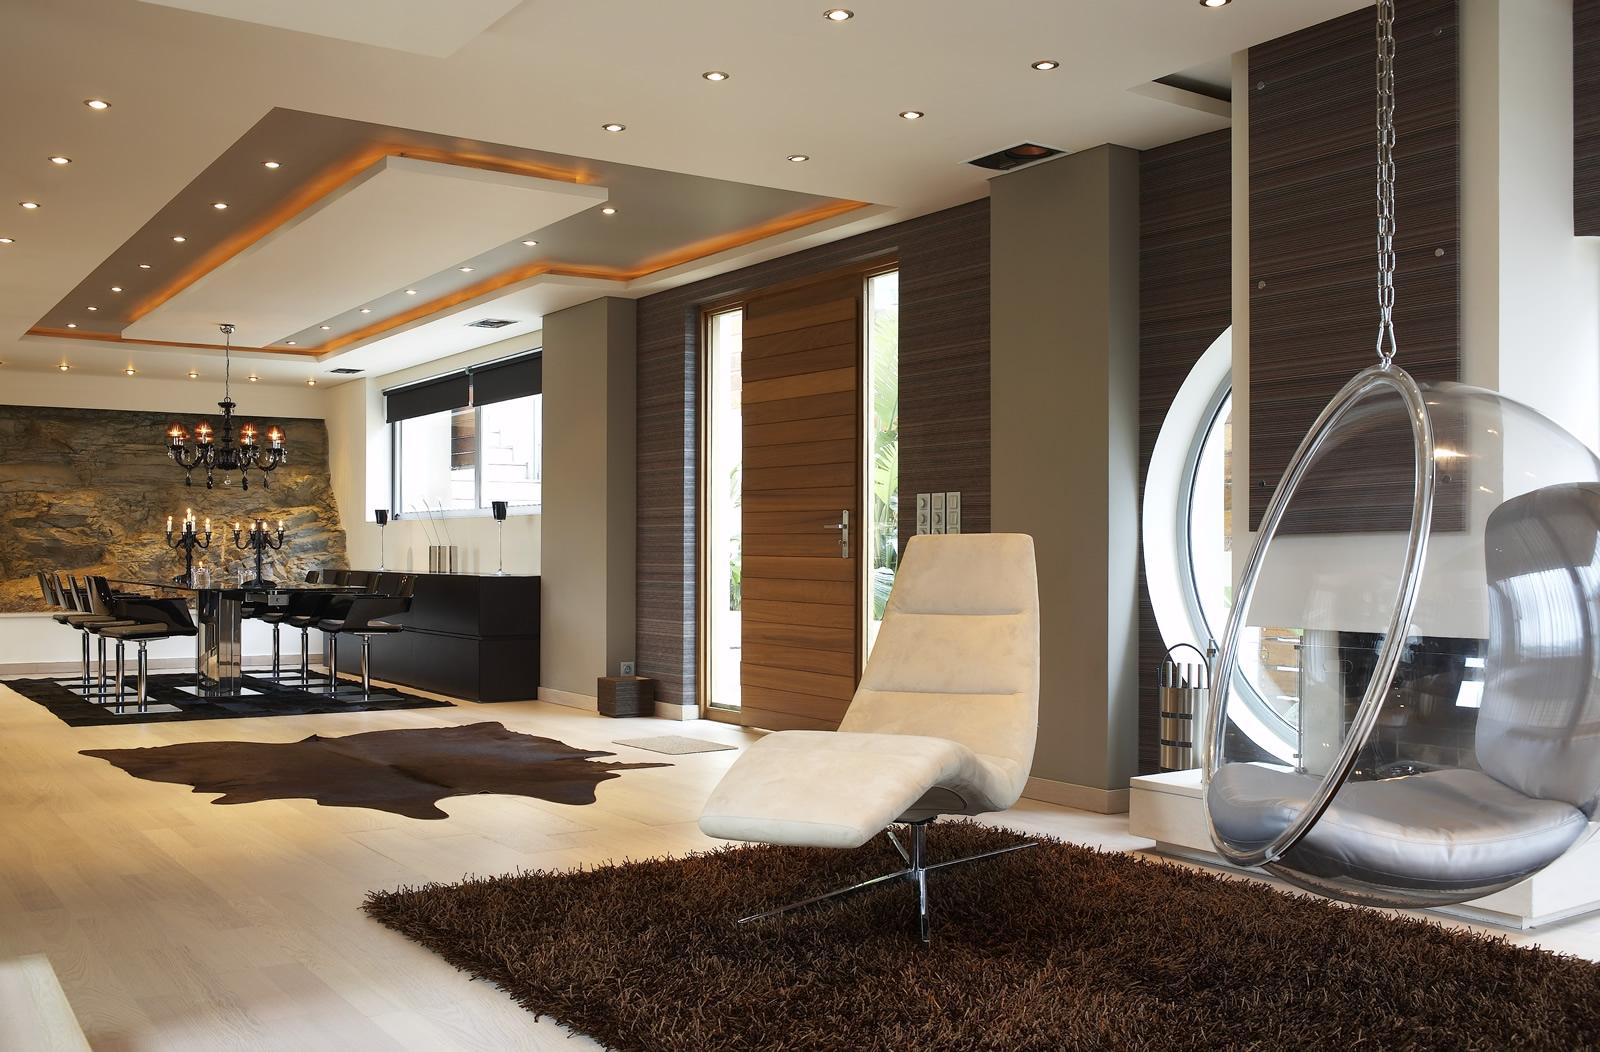 Модерн дизайн дома внутри